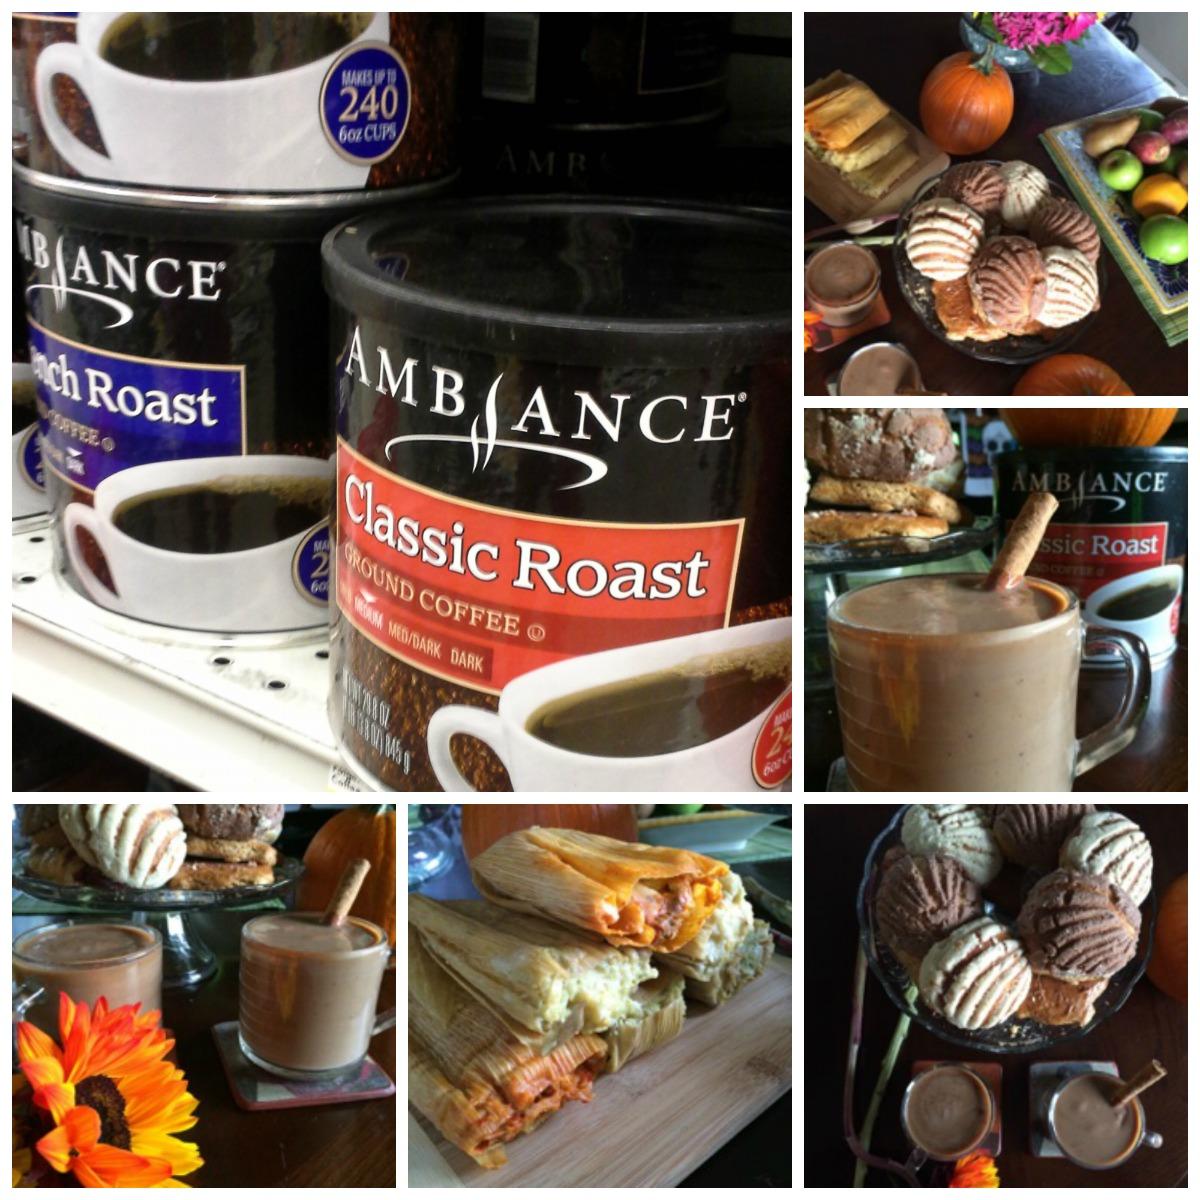 Pumpkin Spiced Champurrado with Ambiance Coffee